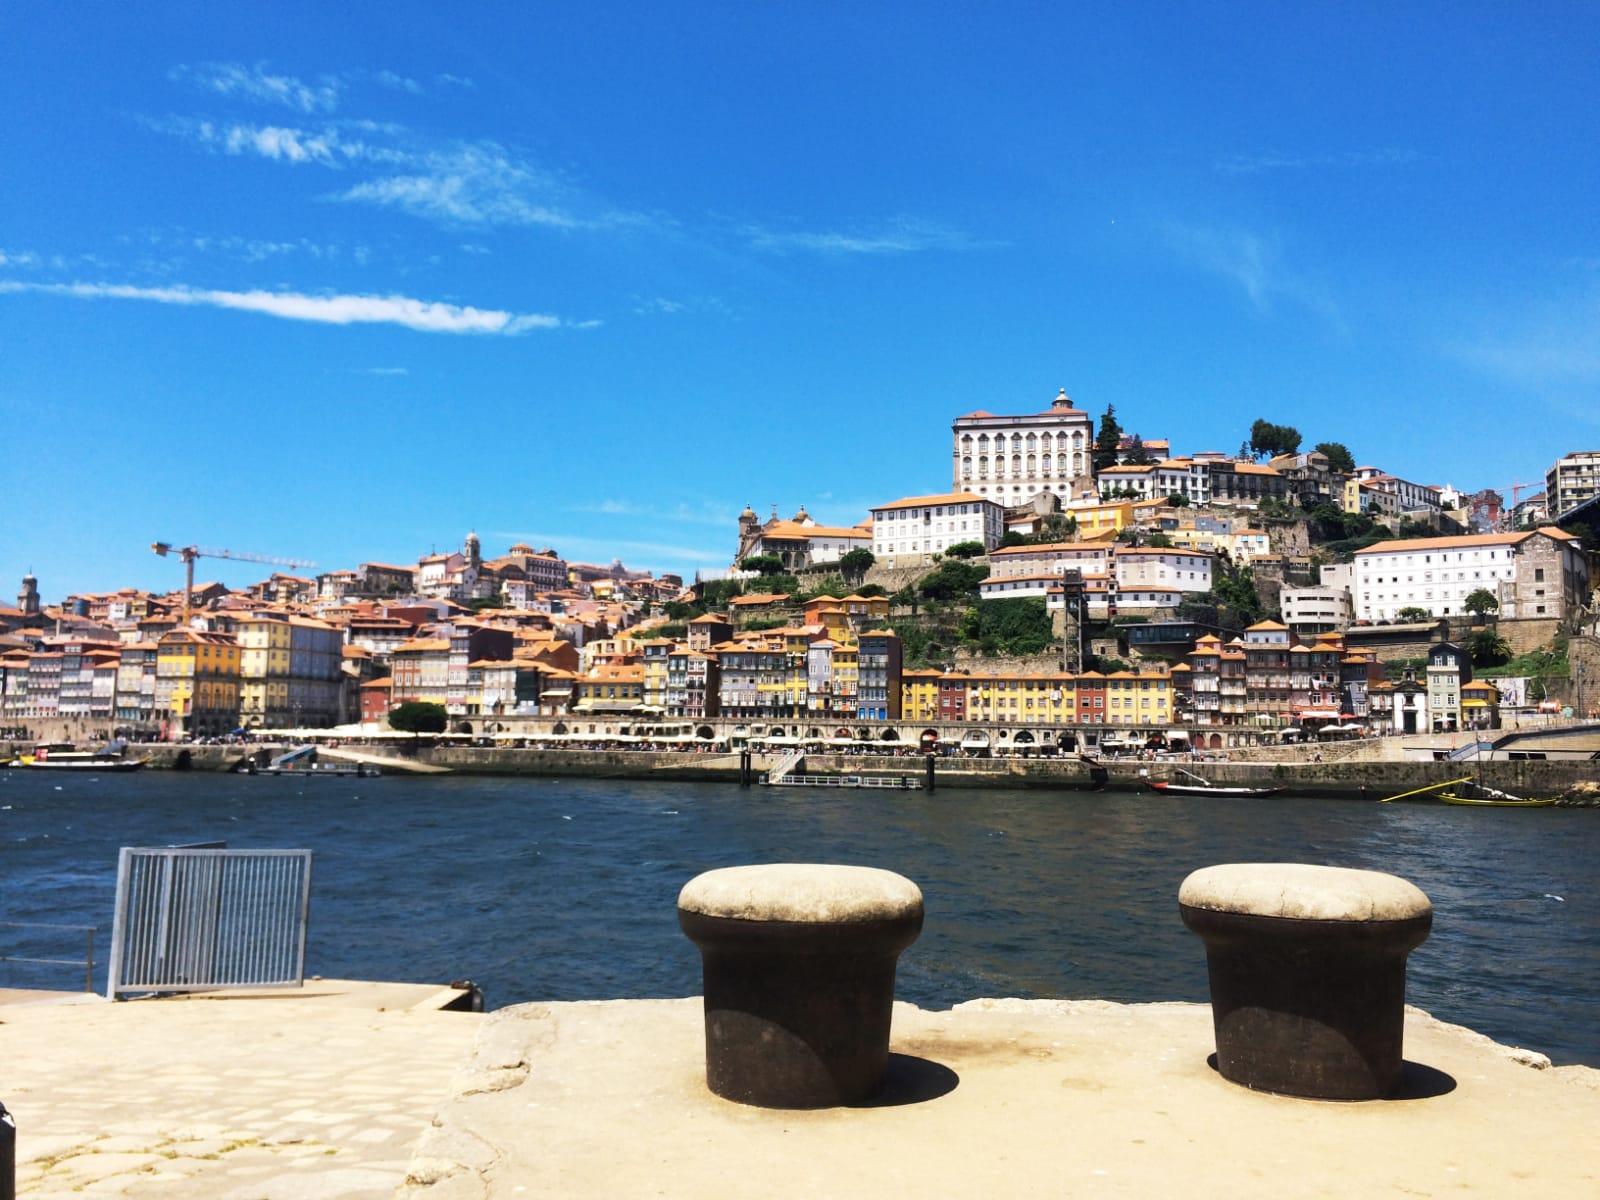 visiter-ville-de-porto-portugal-tourisme